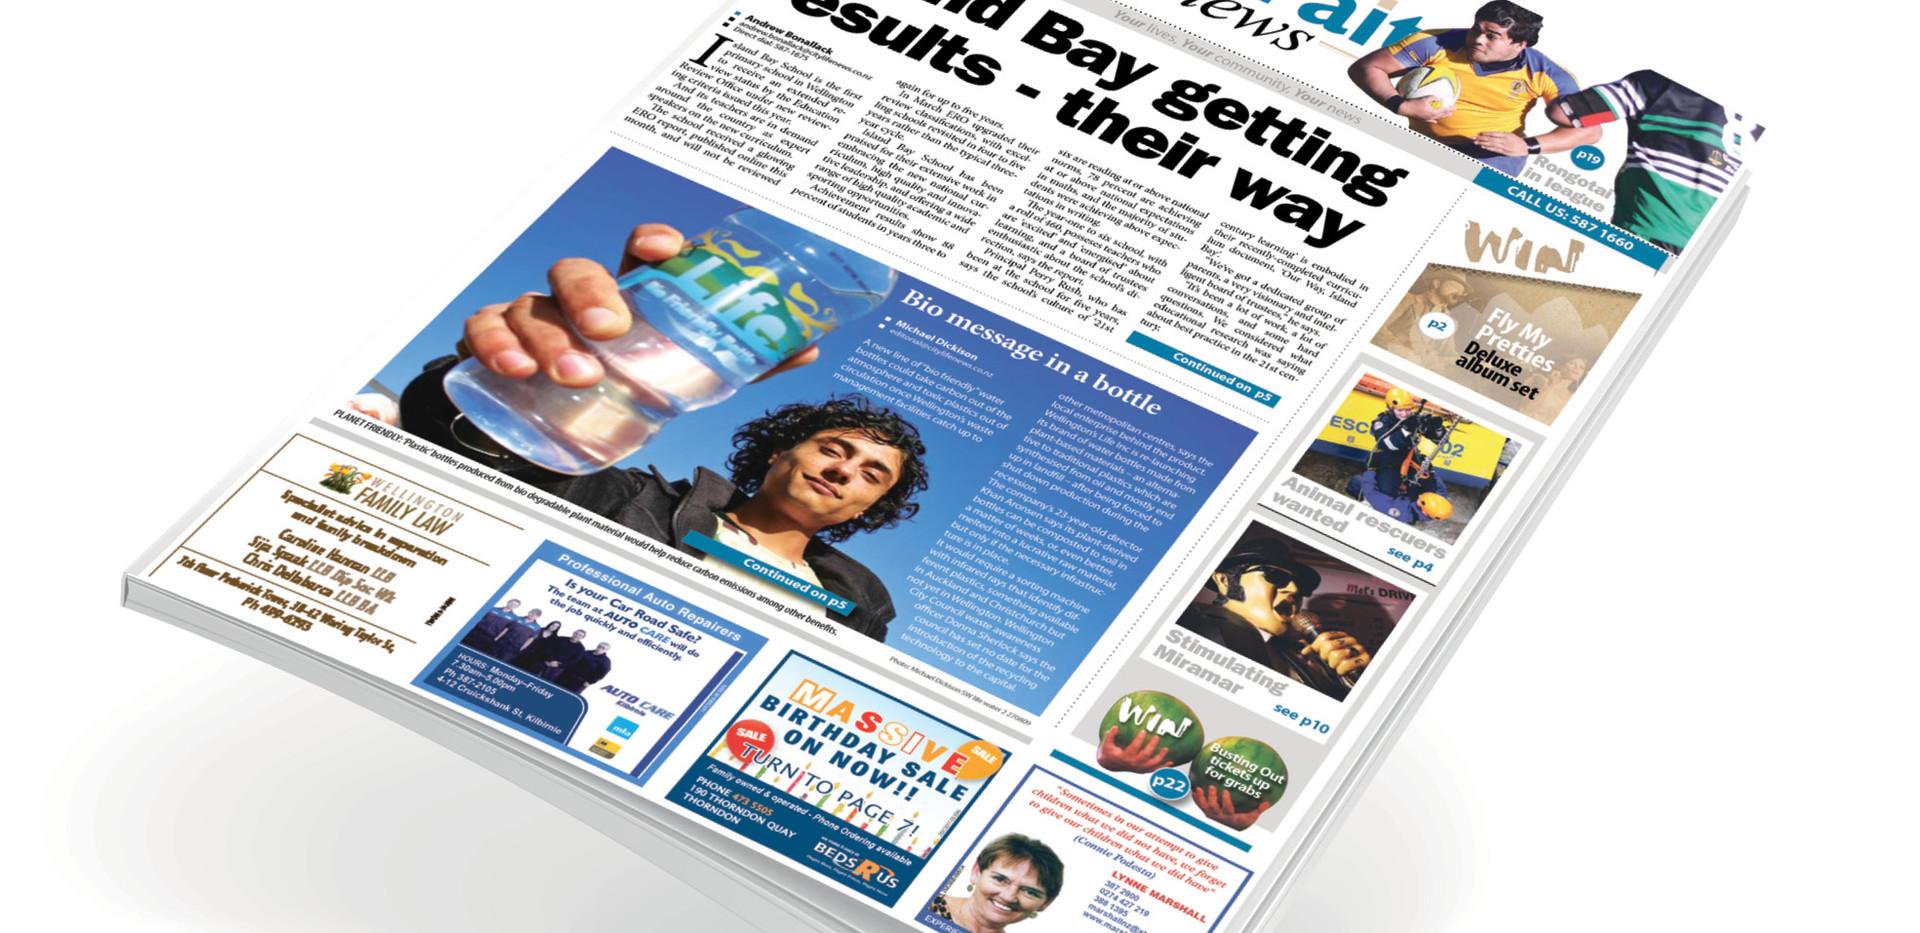 Local newspaper redesign (NZ)